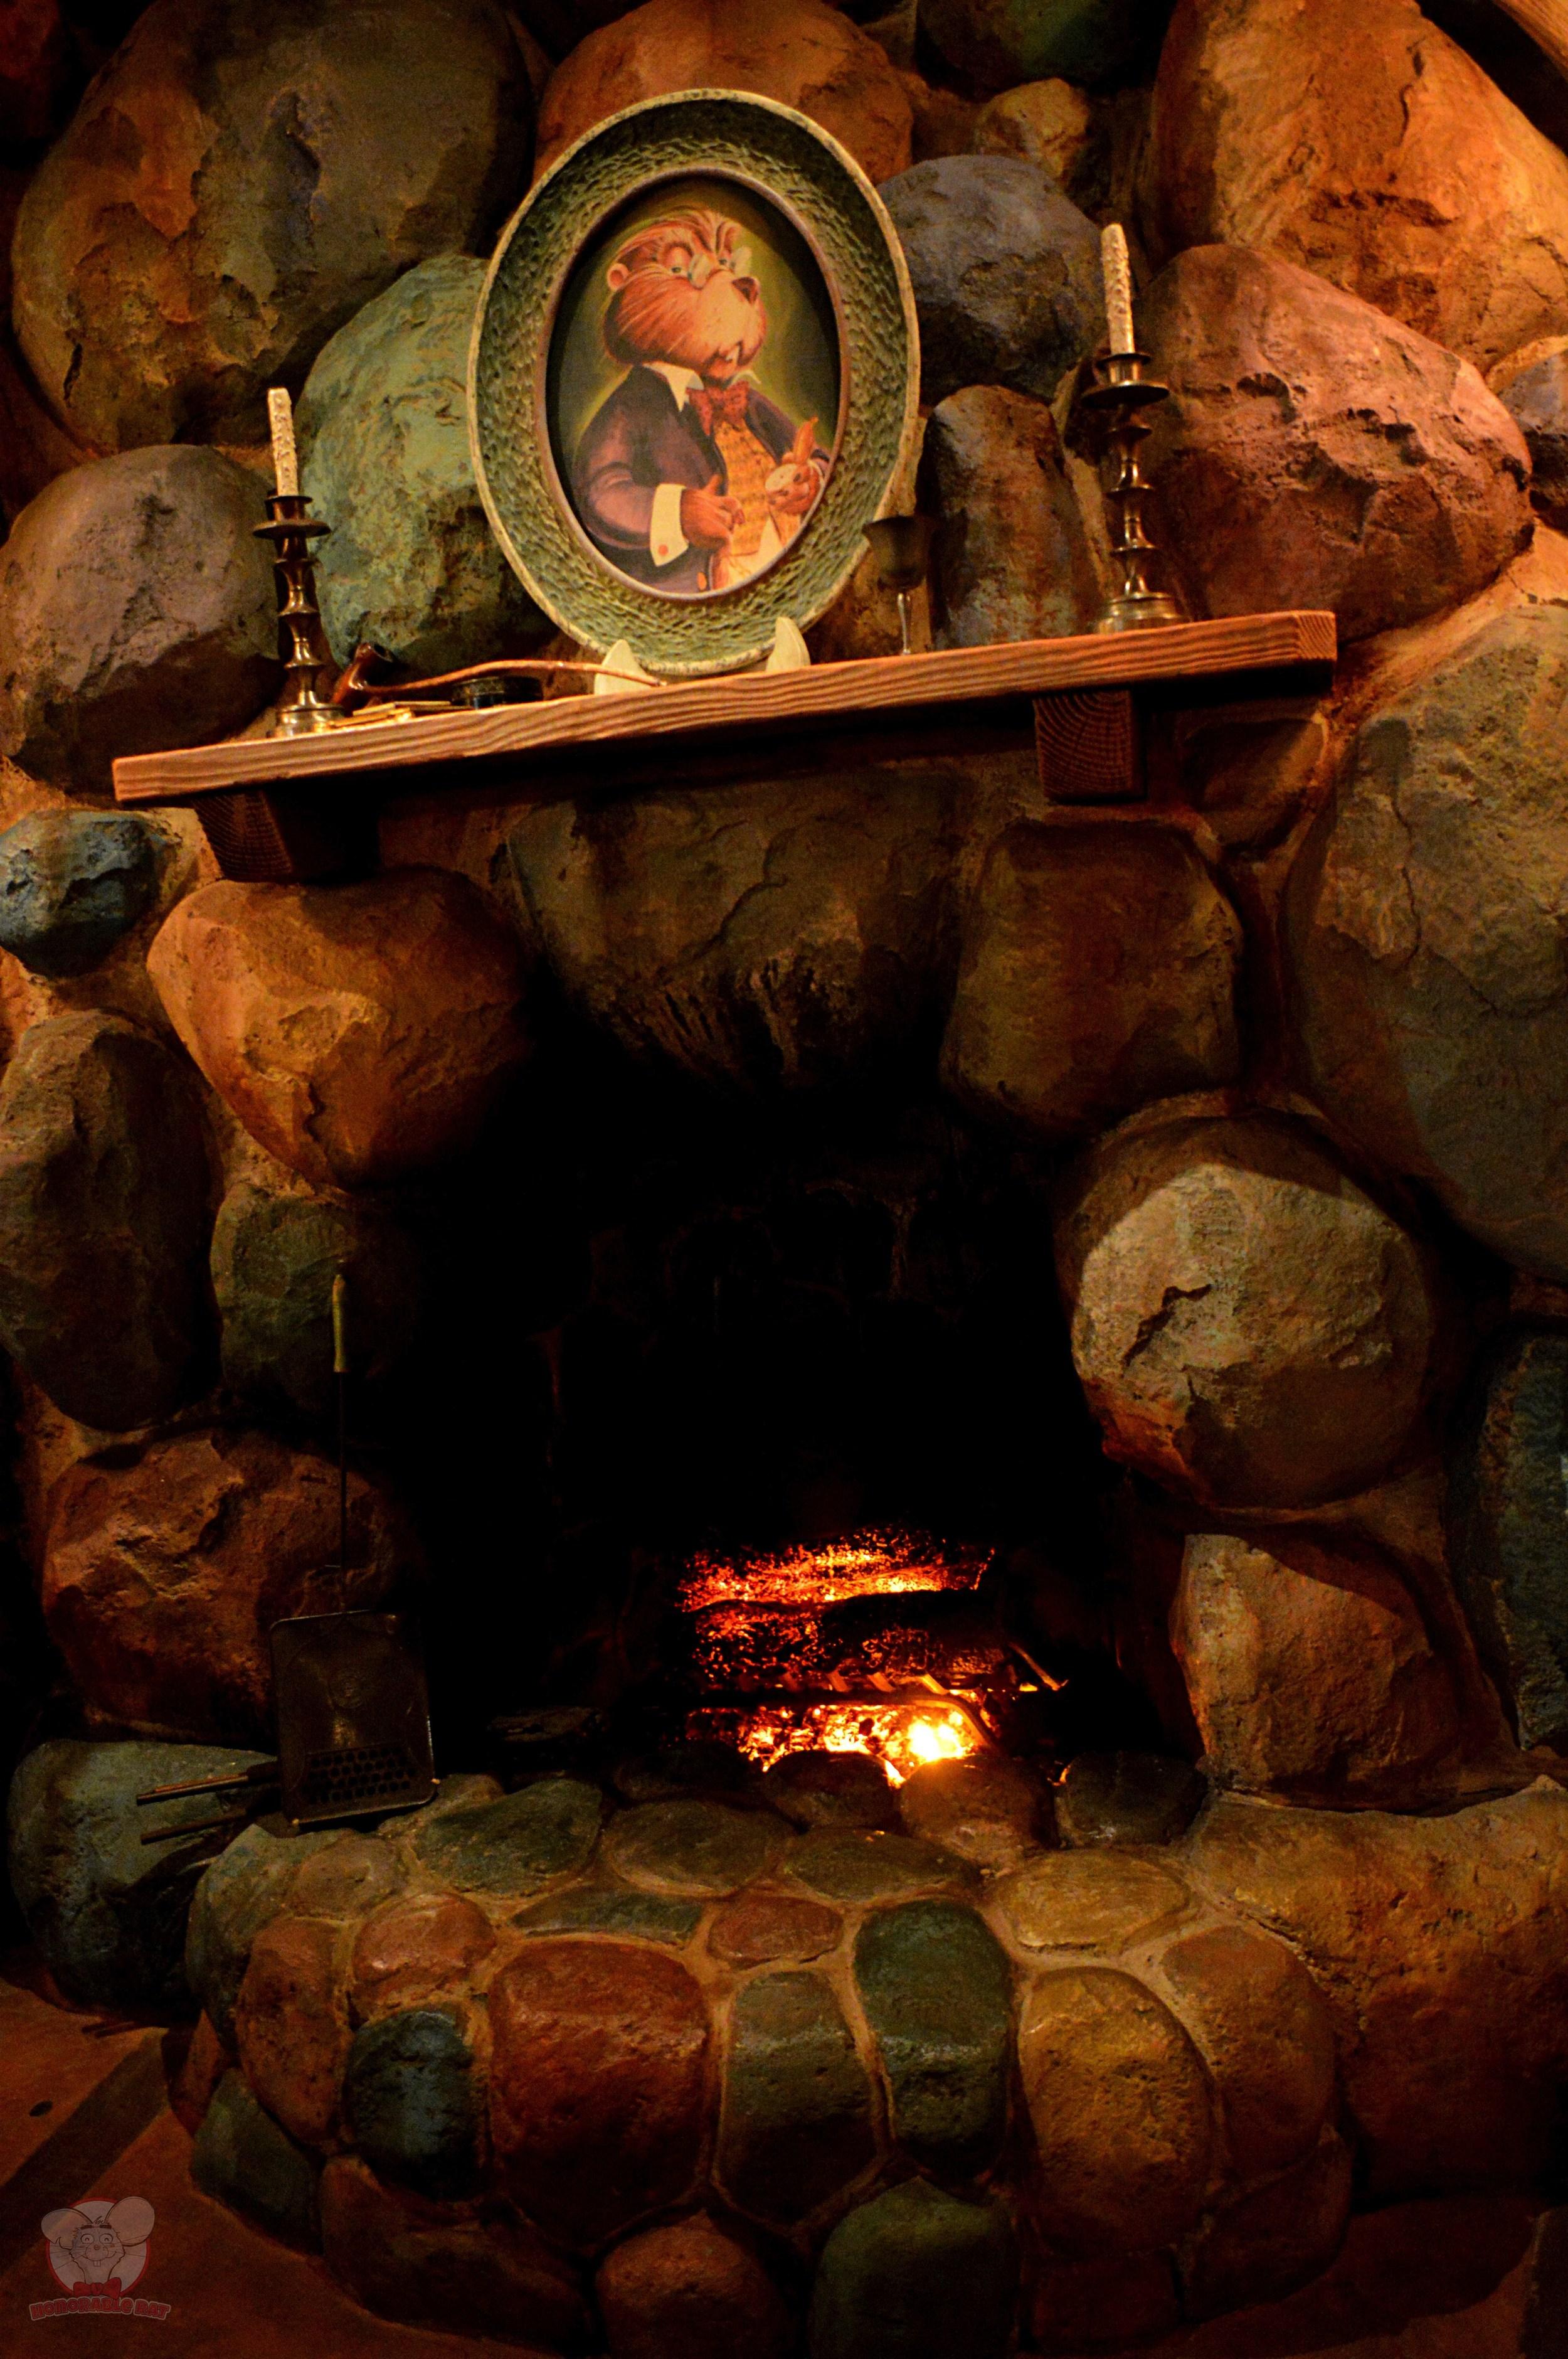 Grandma's Fireplace